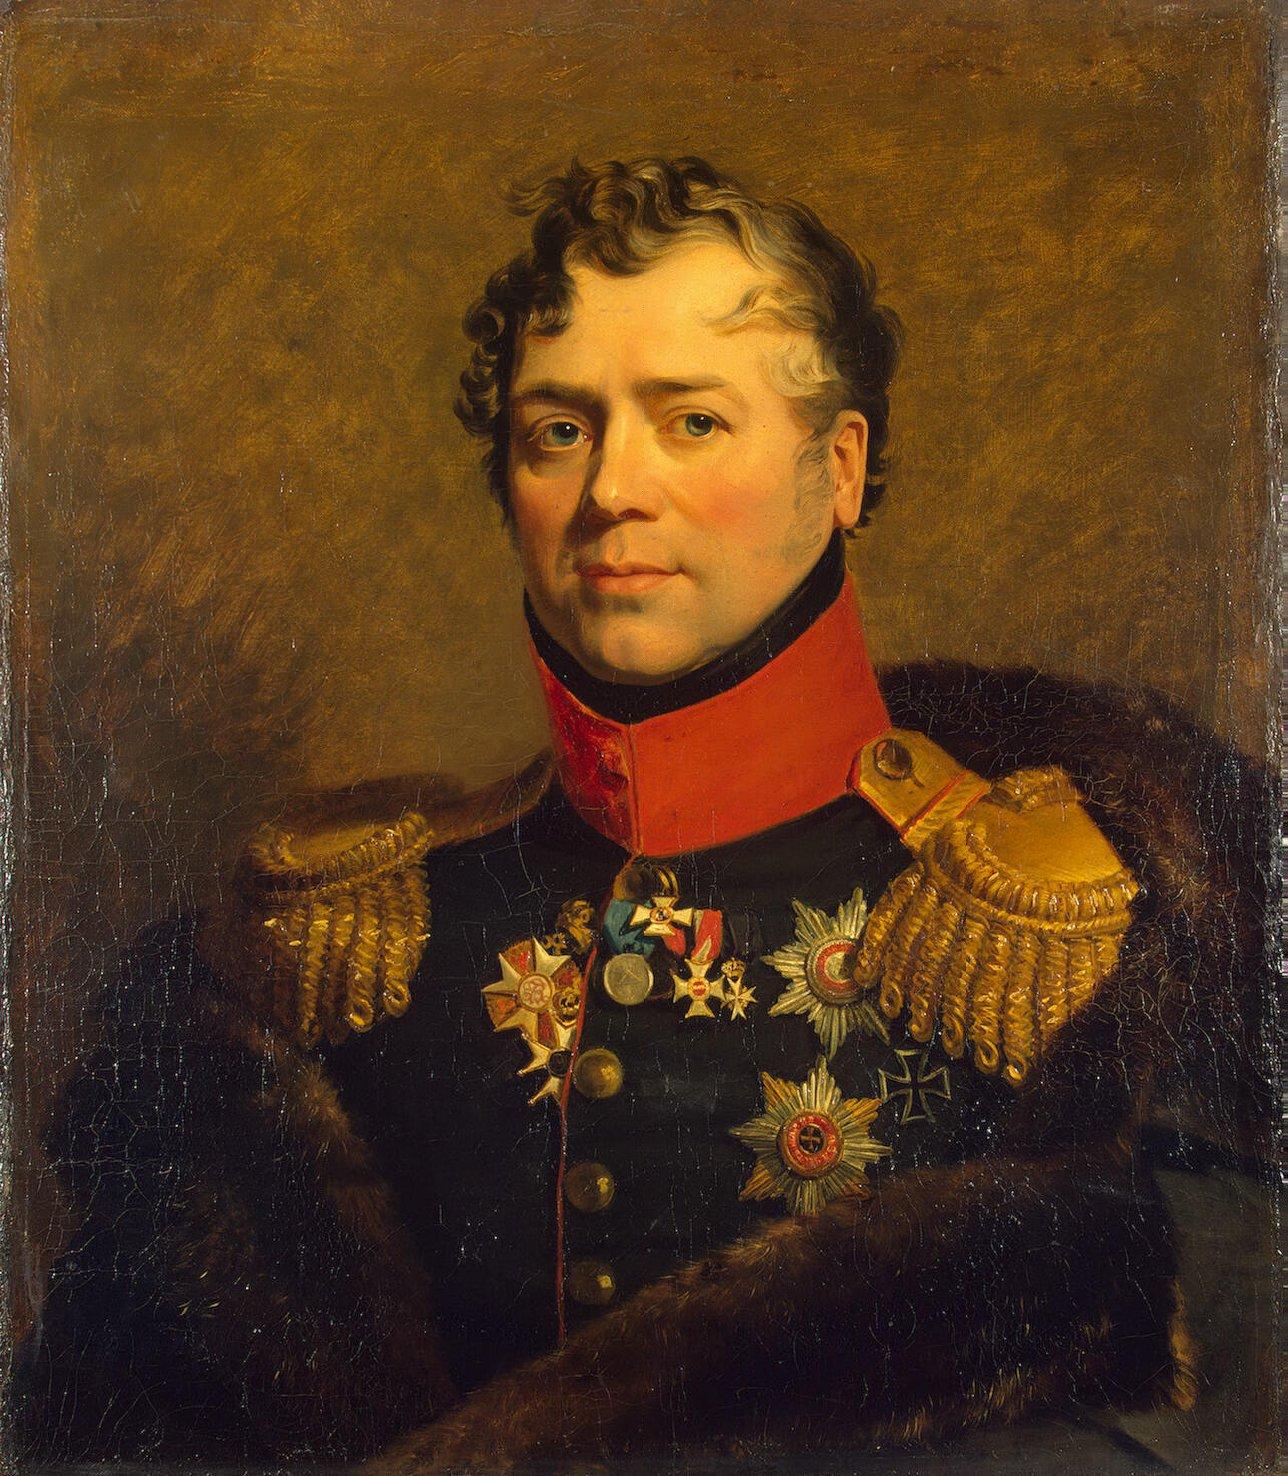 Голицын, Дмитрий Владимирович